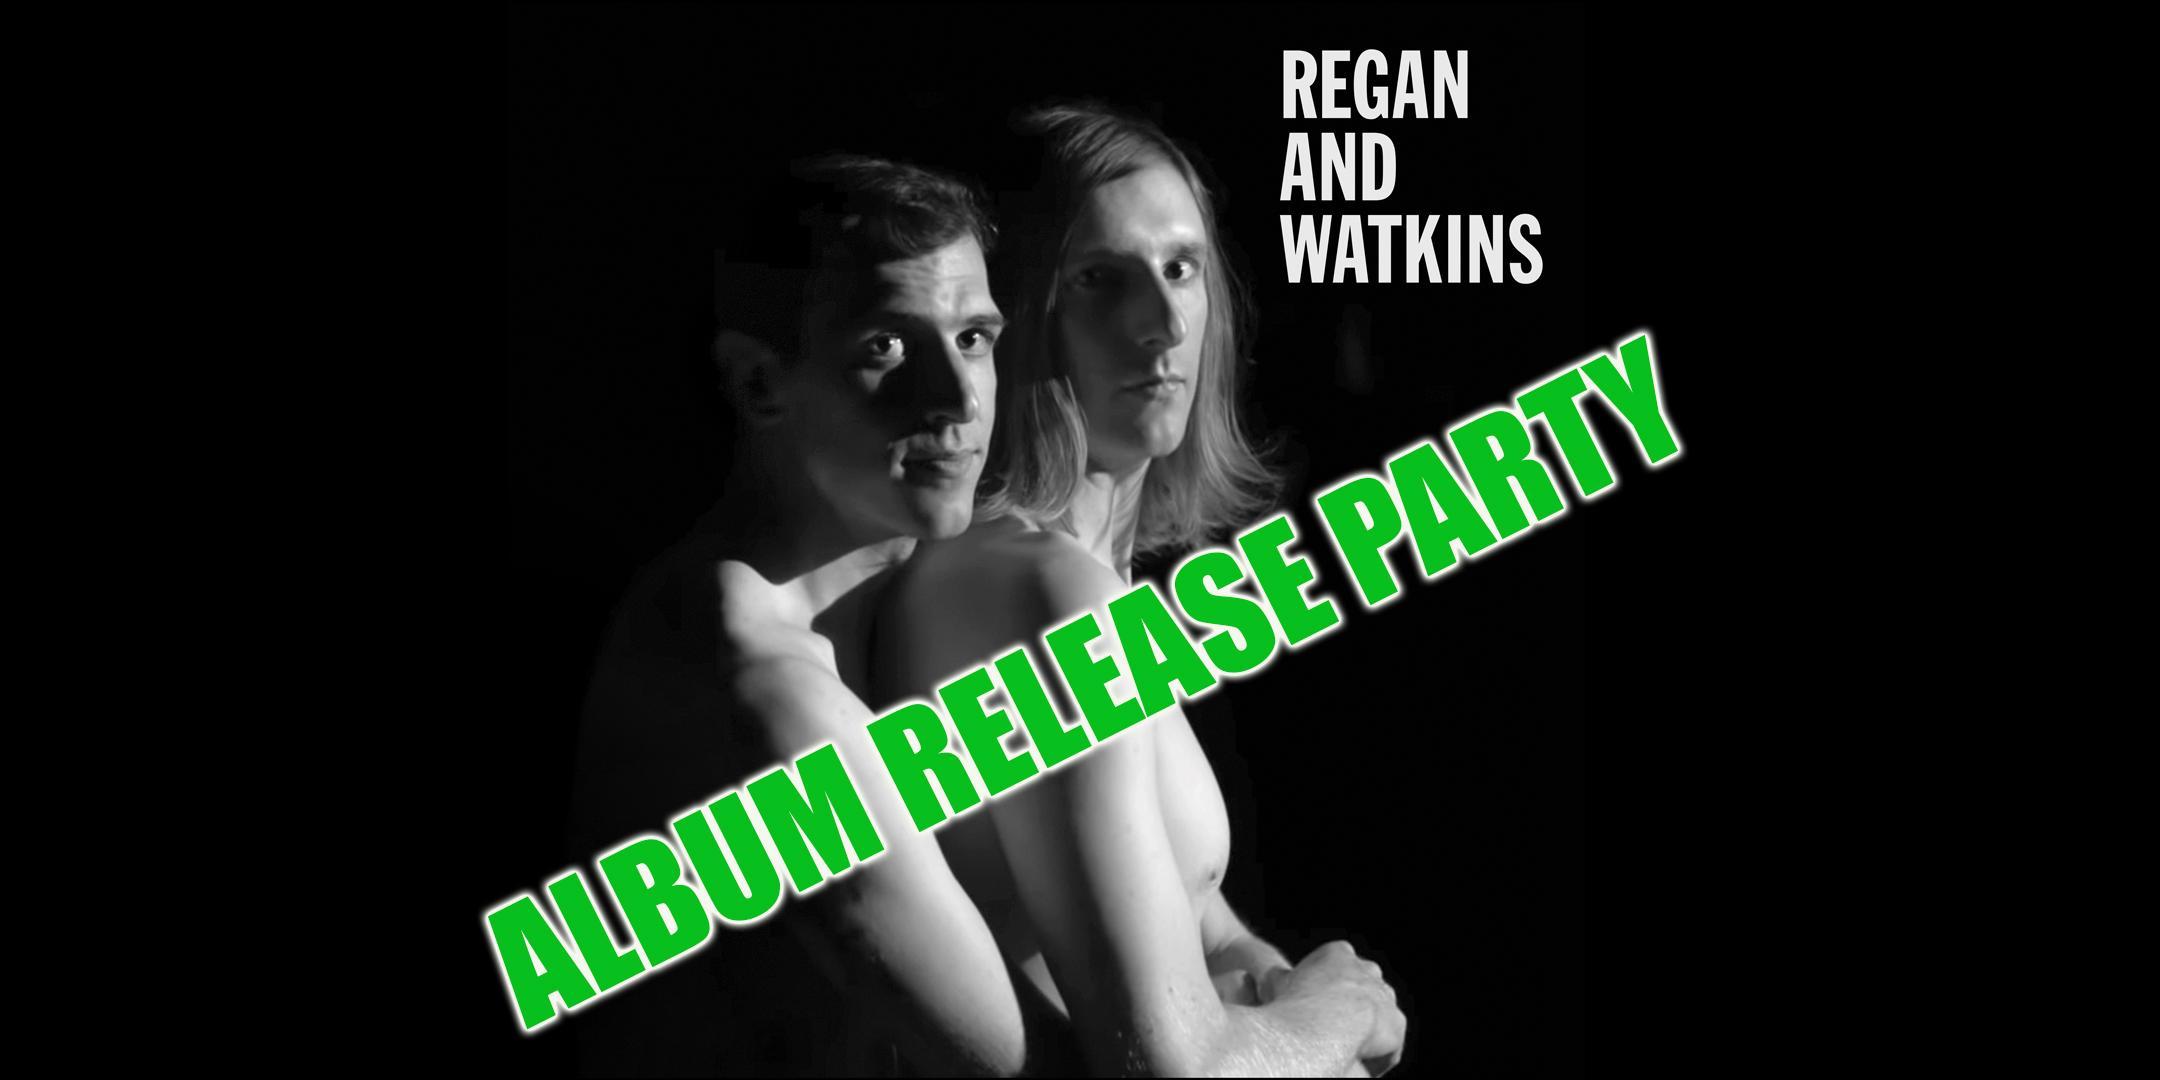 Regan and Watkins Album Release Party